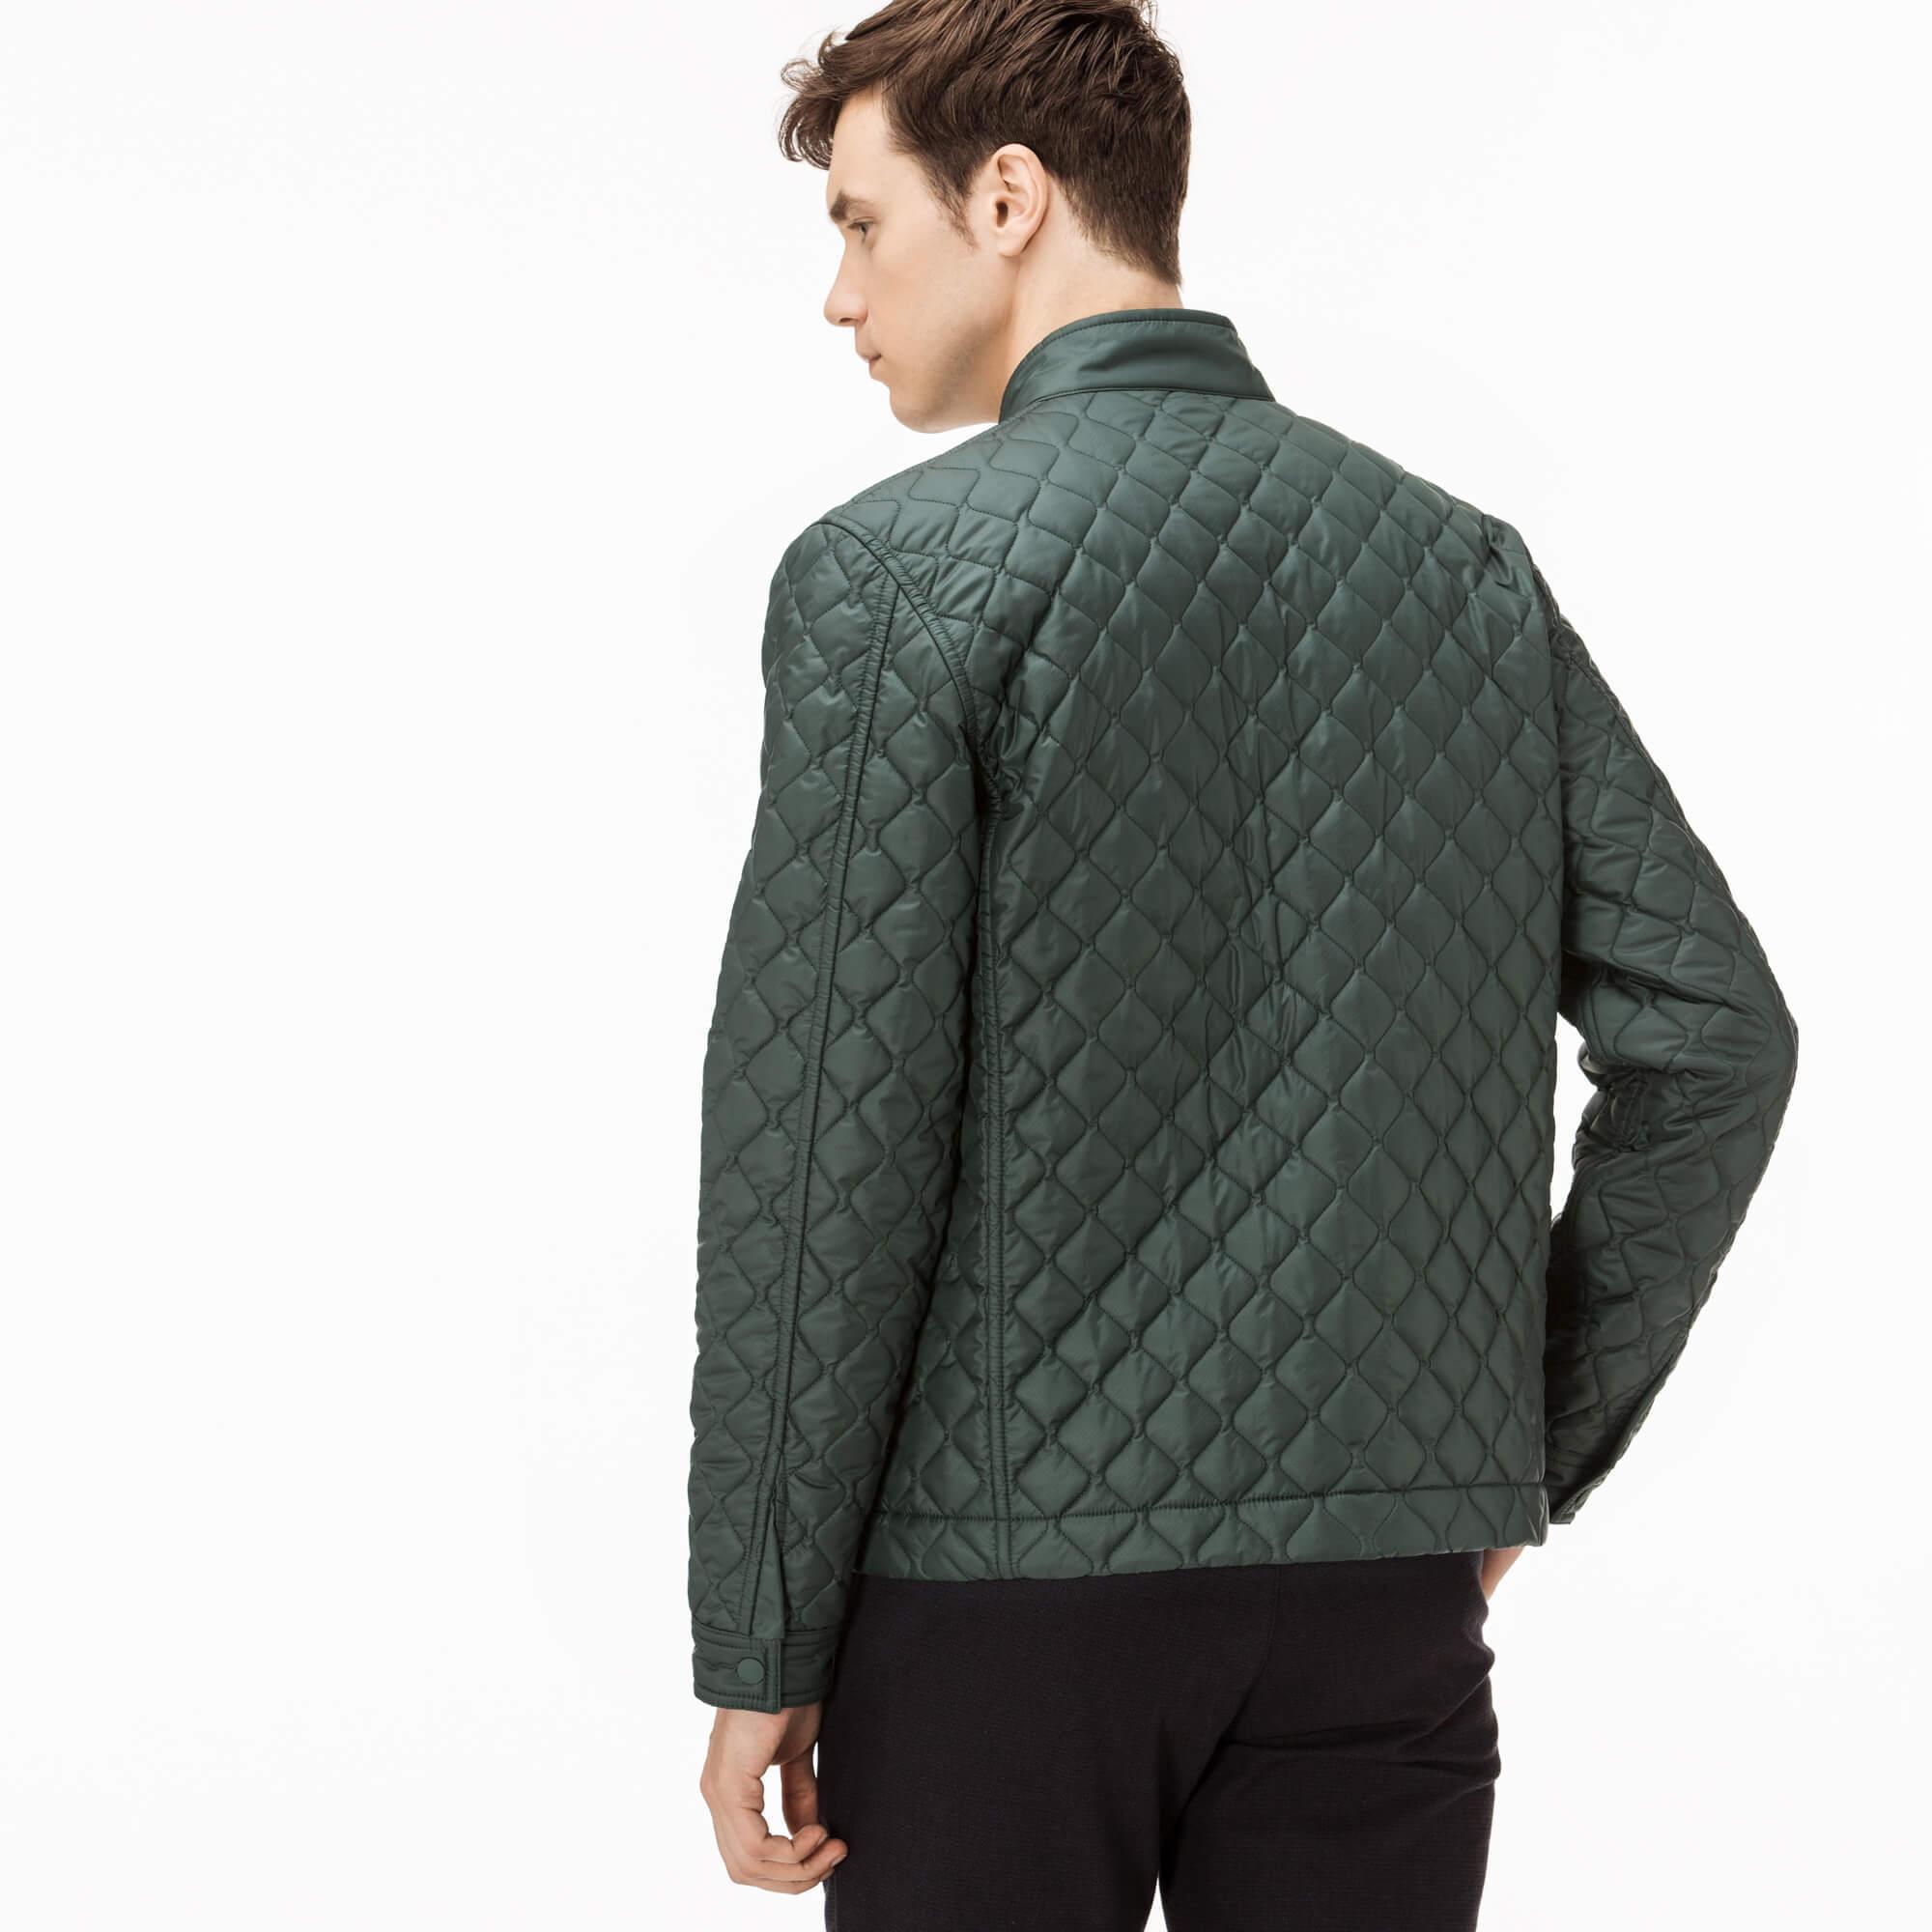 Lacoste Erkek Lacivert-Yeşil Çift Taraflı Mont